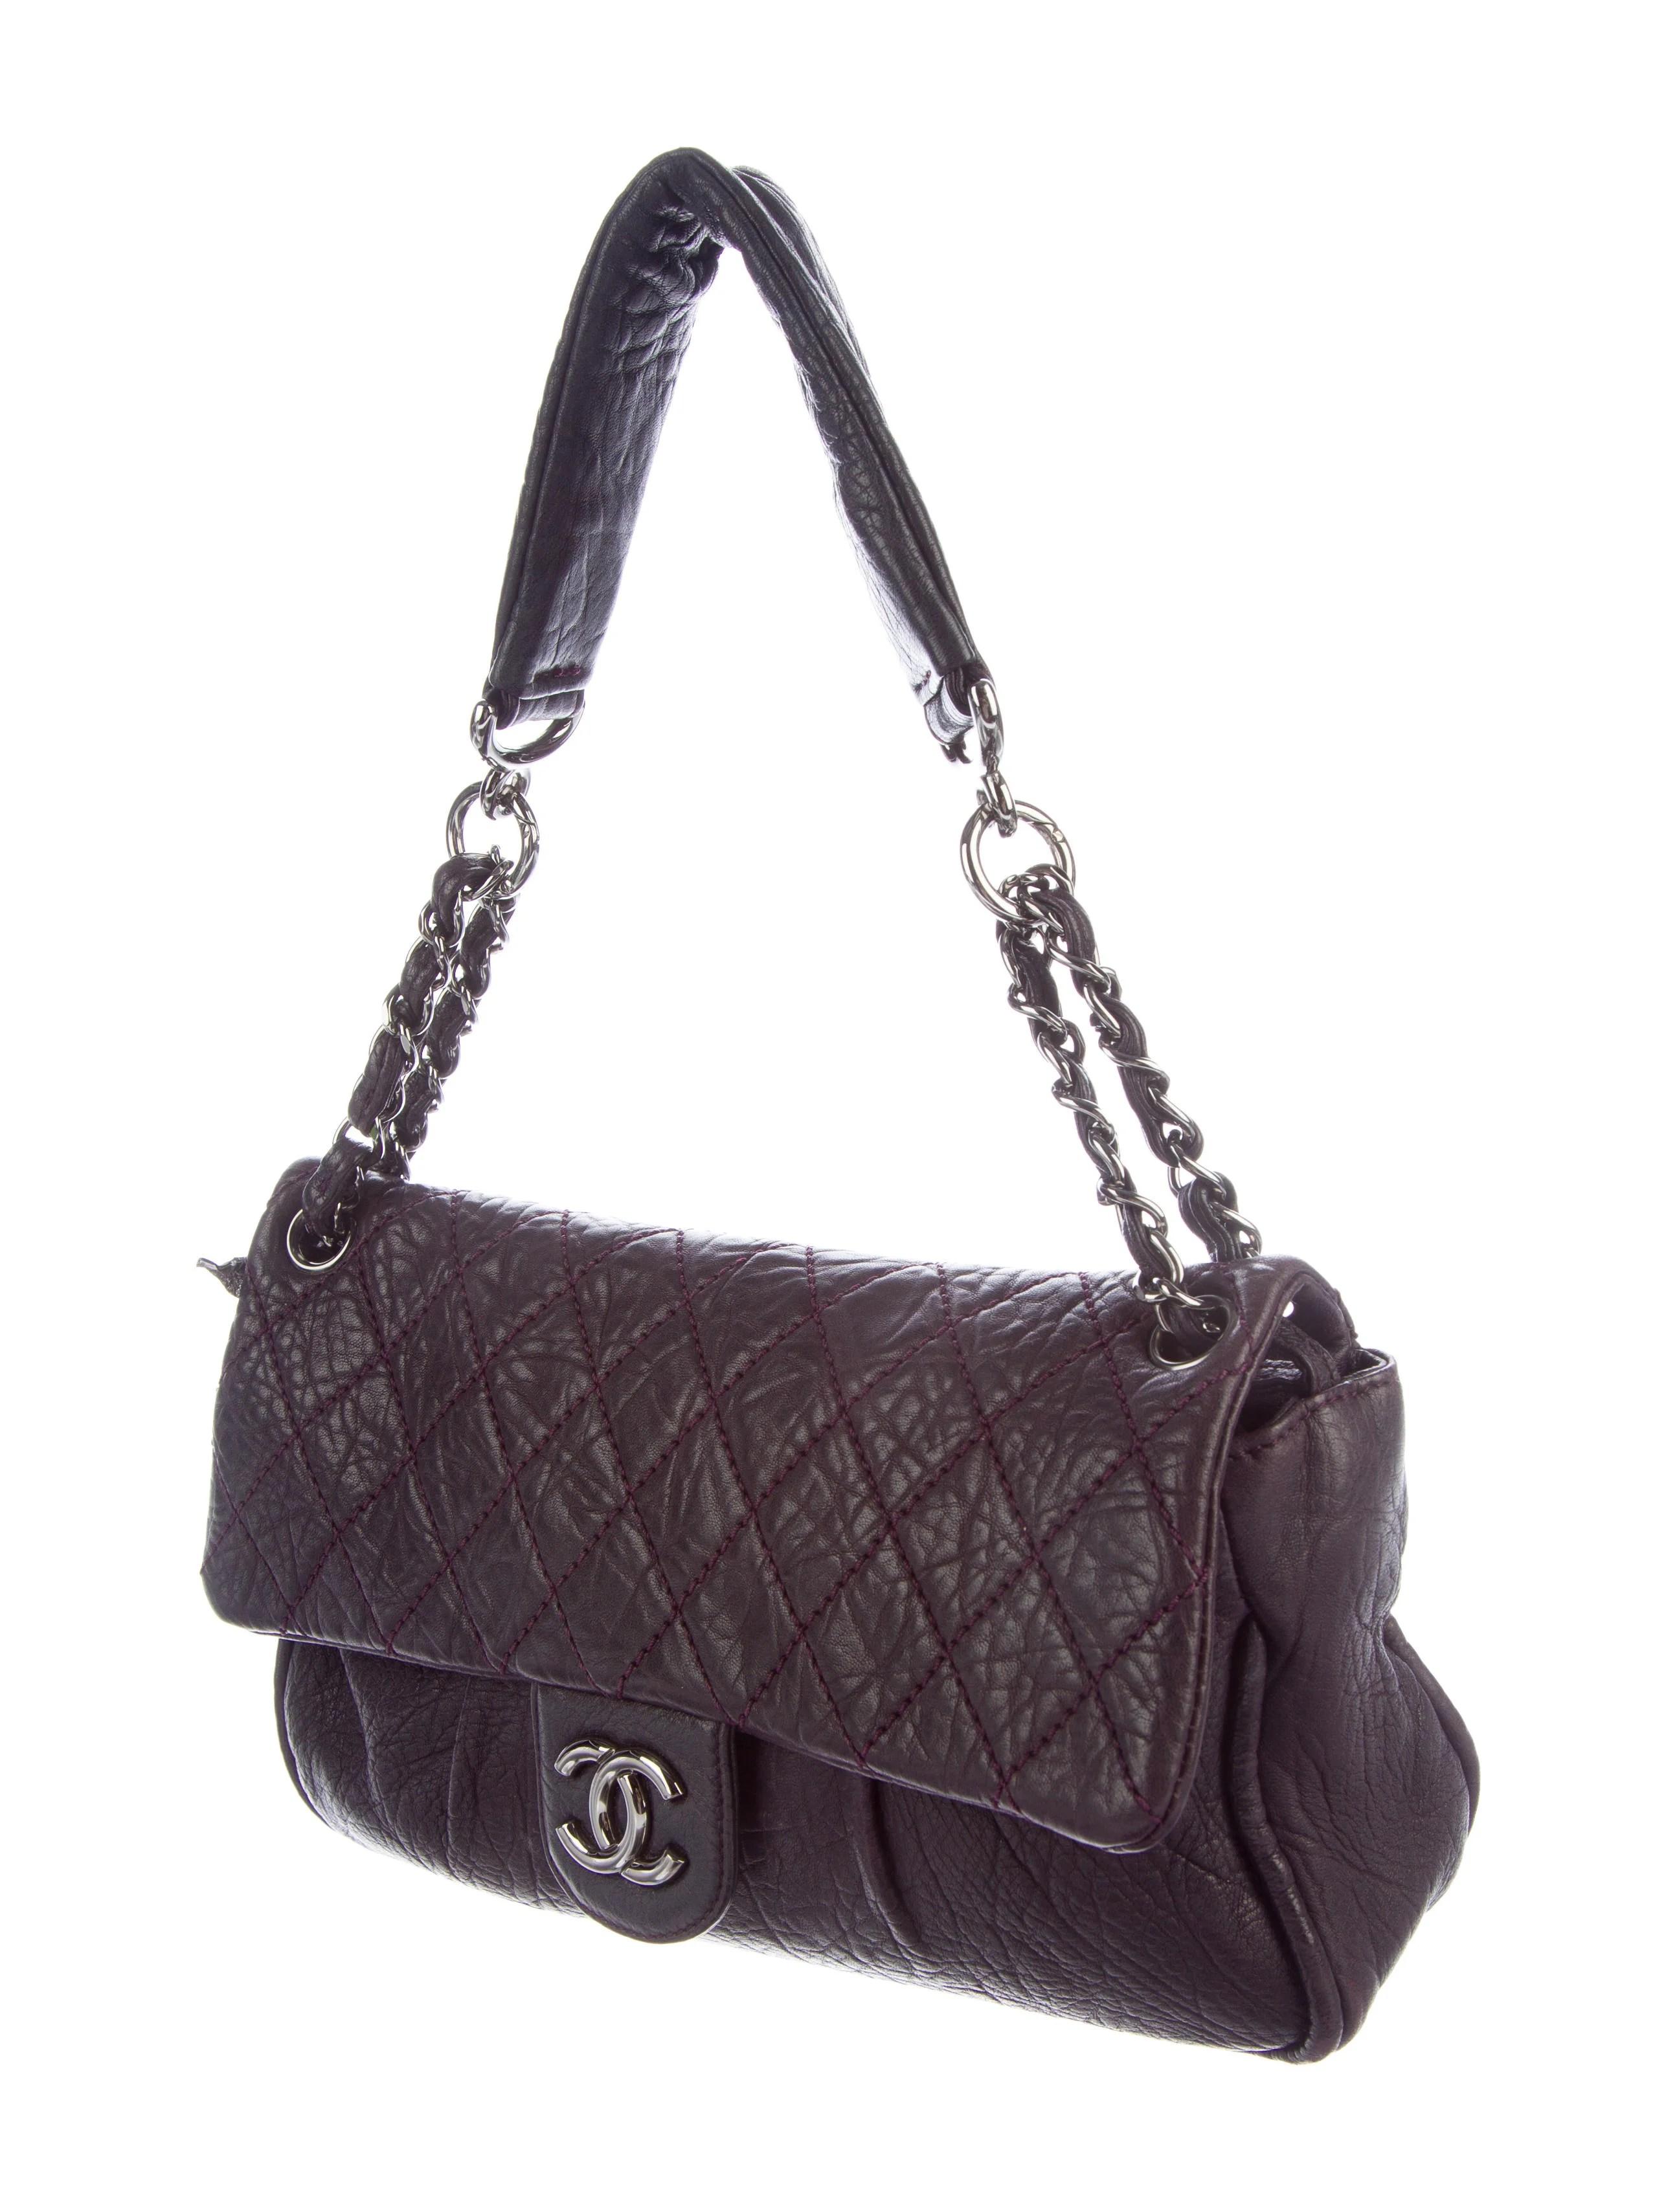 Chanel Coco Pleats Flap Bag - Handbags - CHA196997   The ...